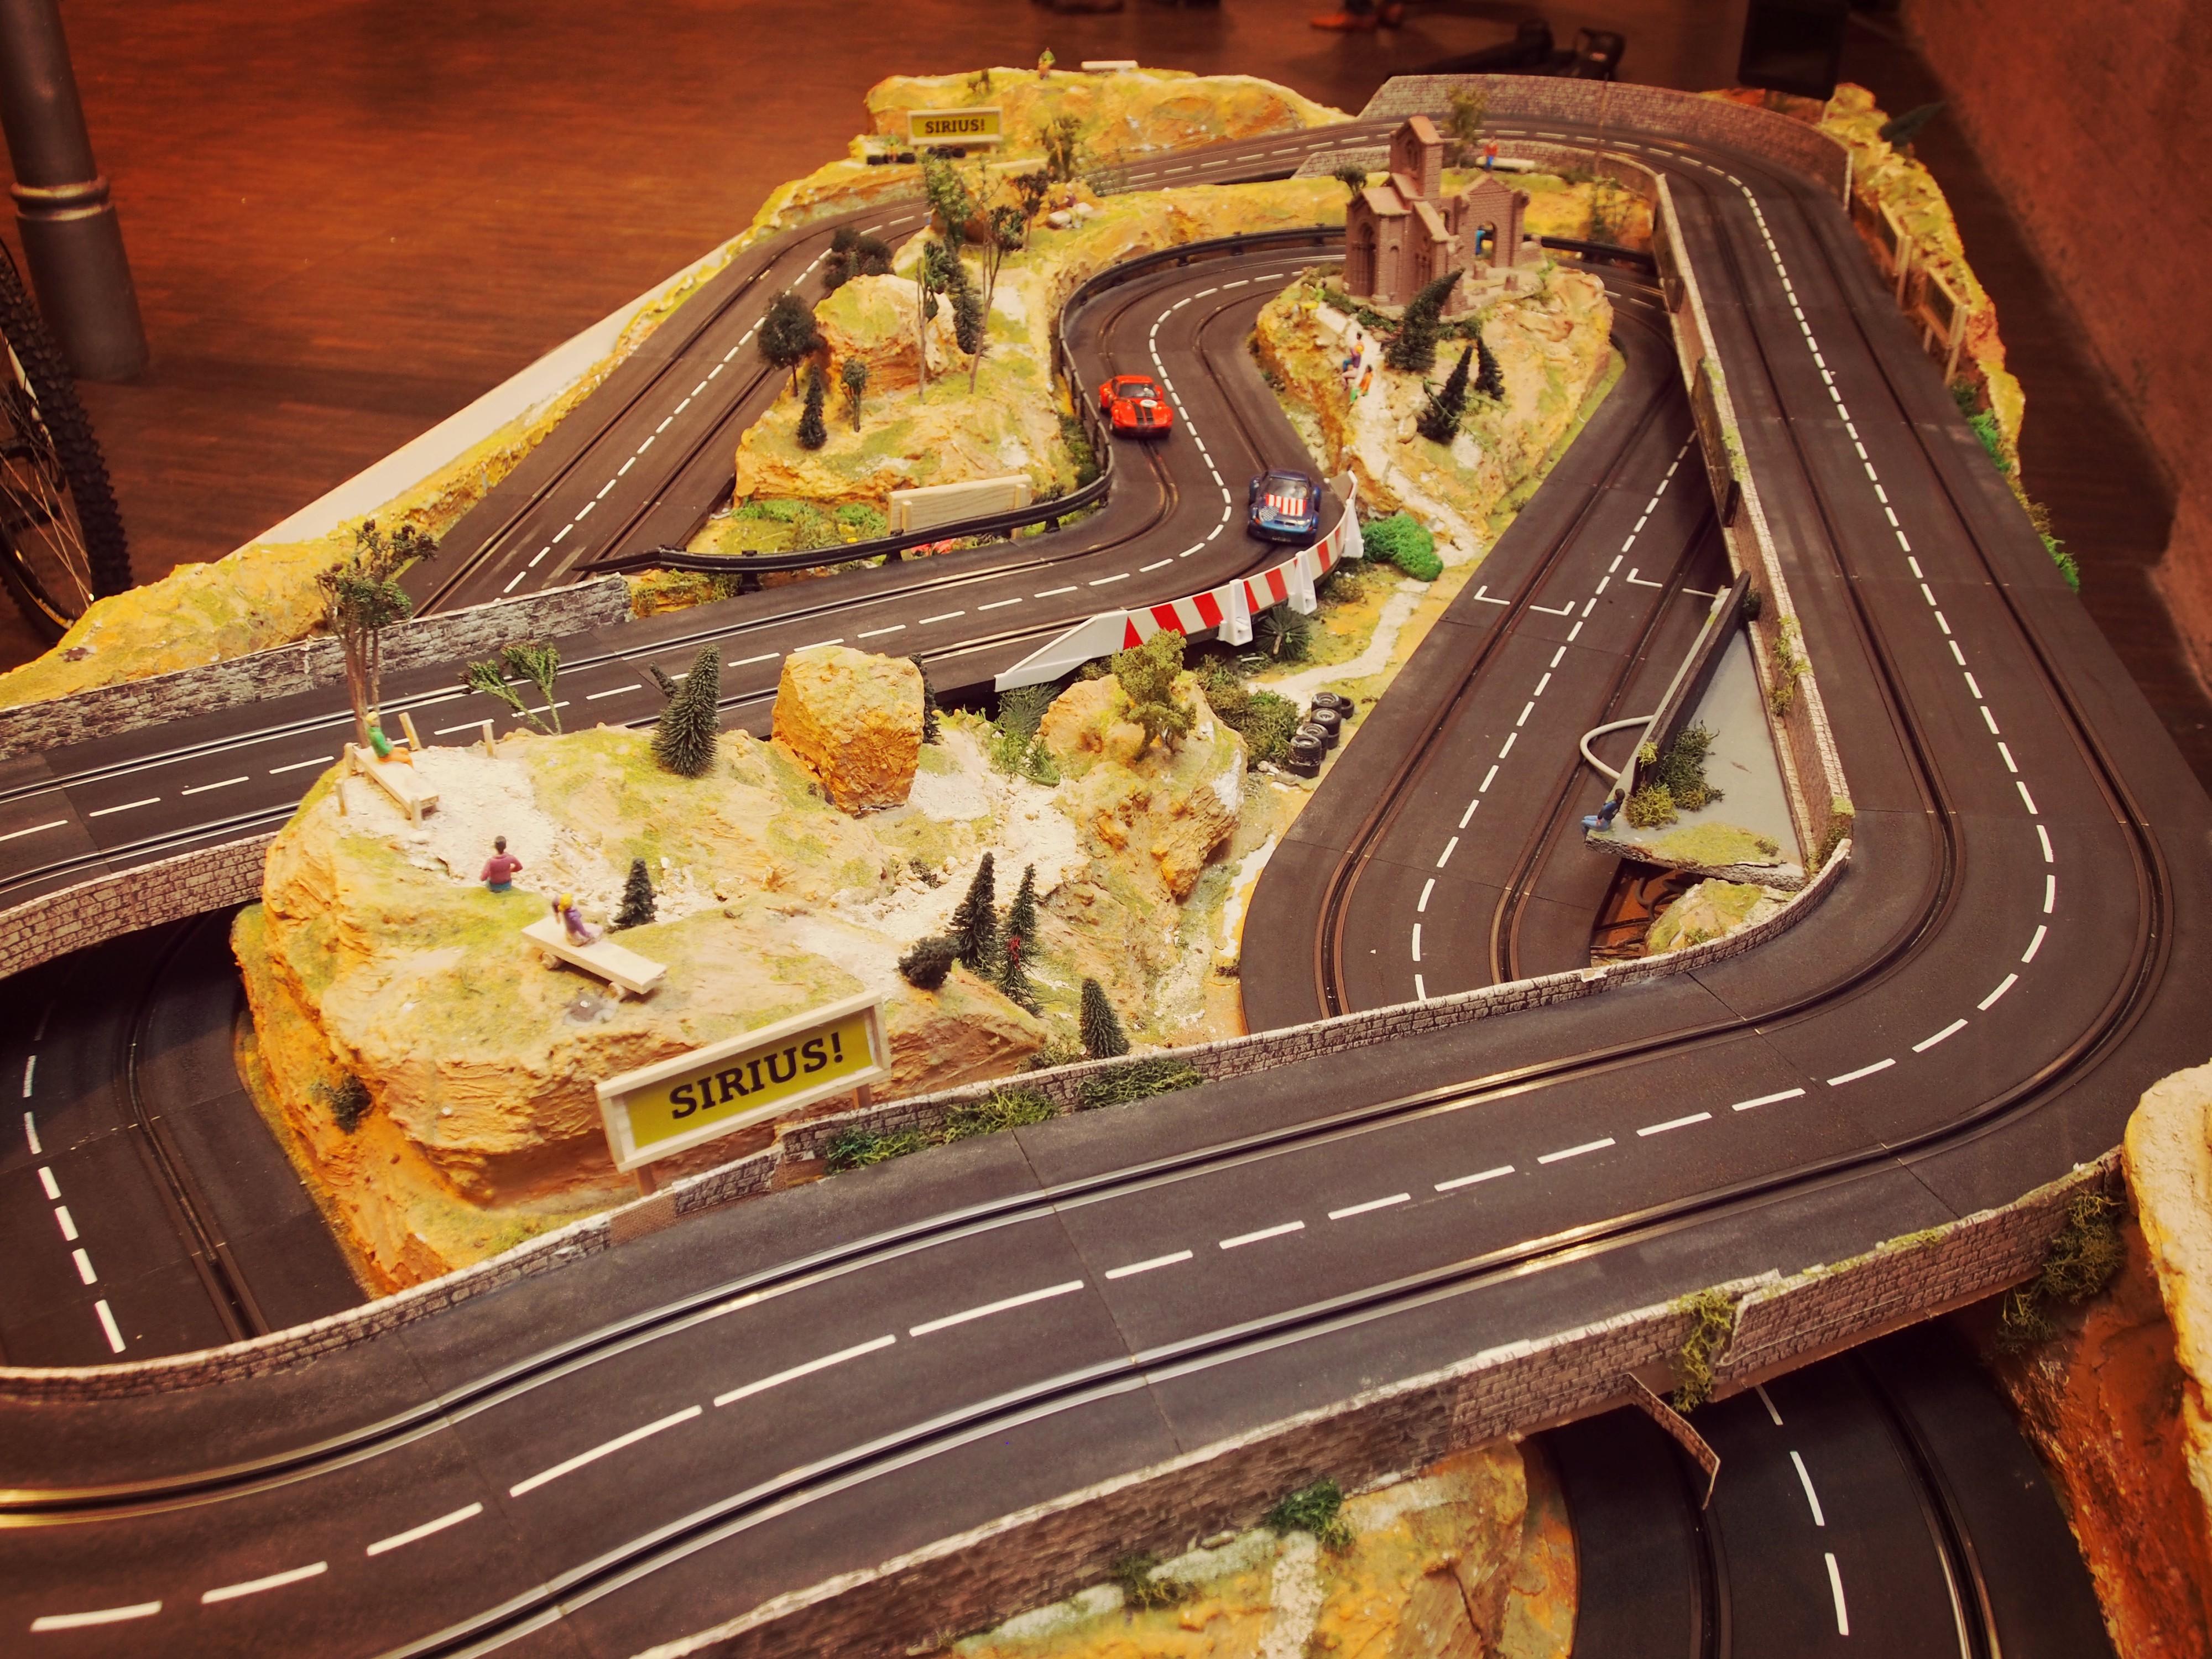 Carrerabahn mit Fahrradabtríeb